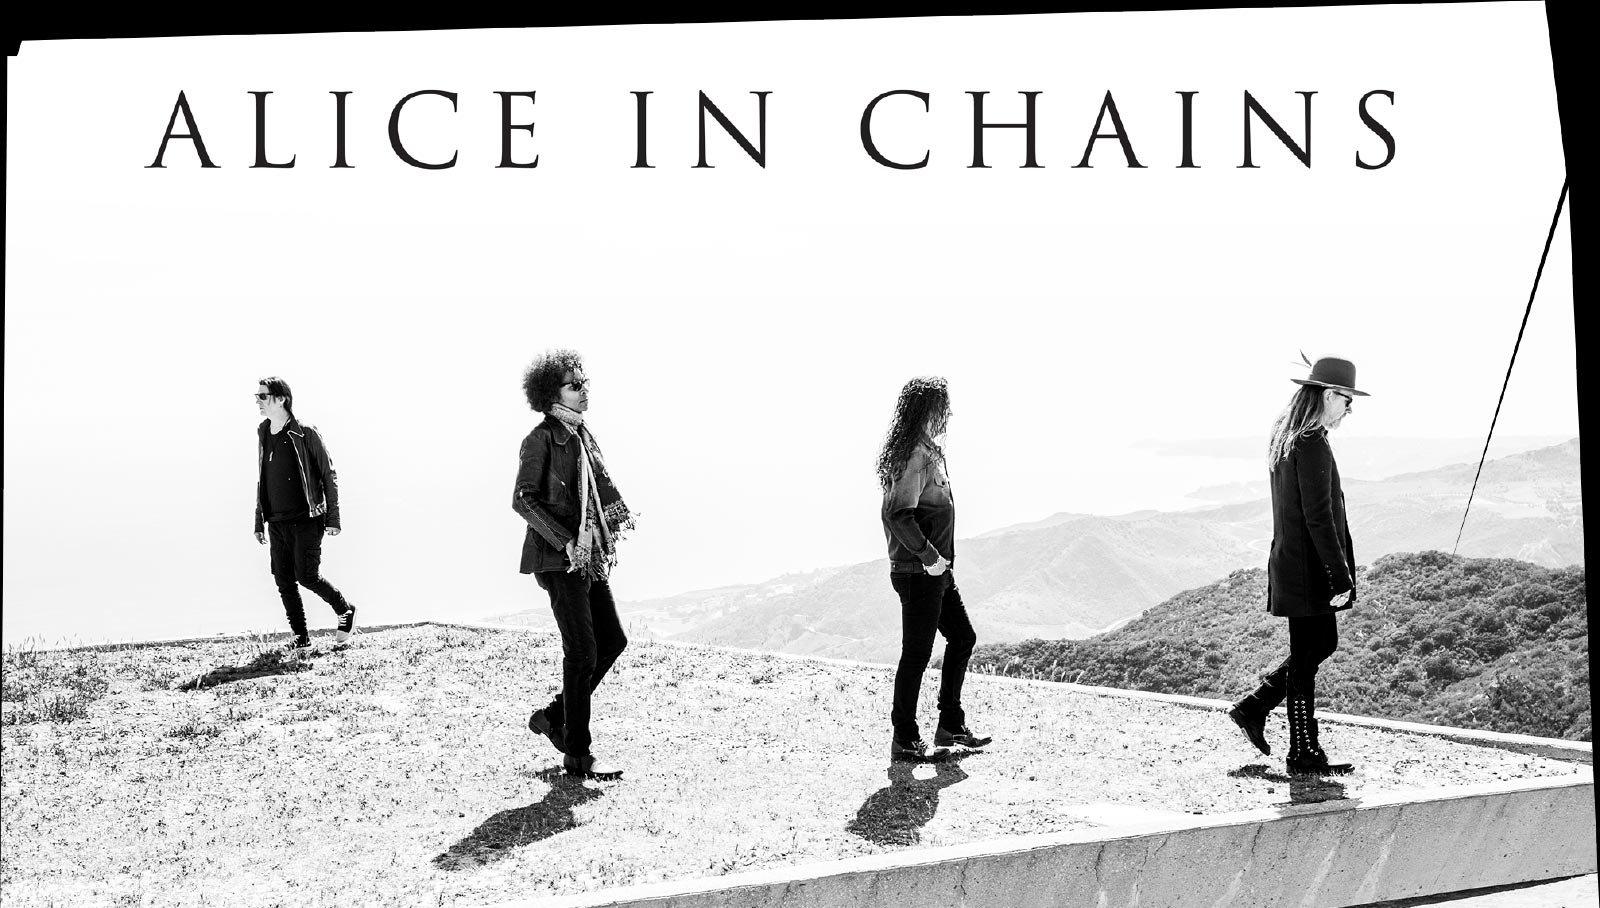 Alice in Chains Announces 2019 EuropeanTour